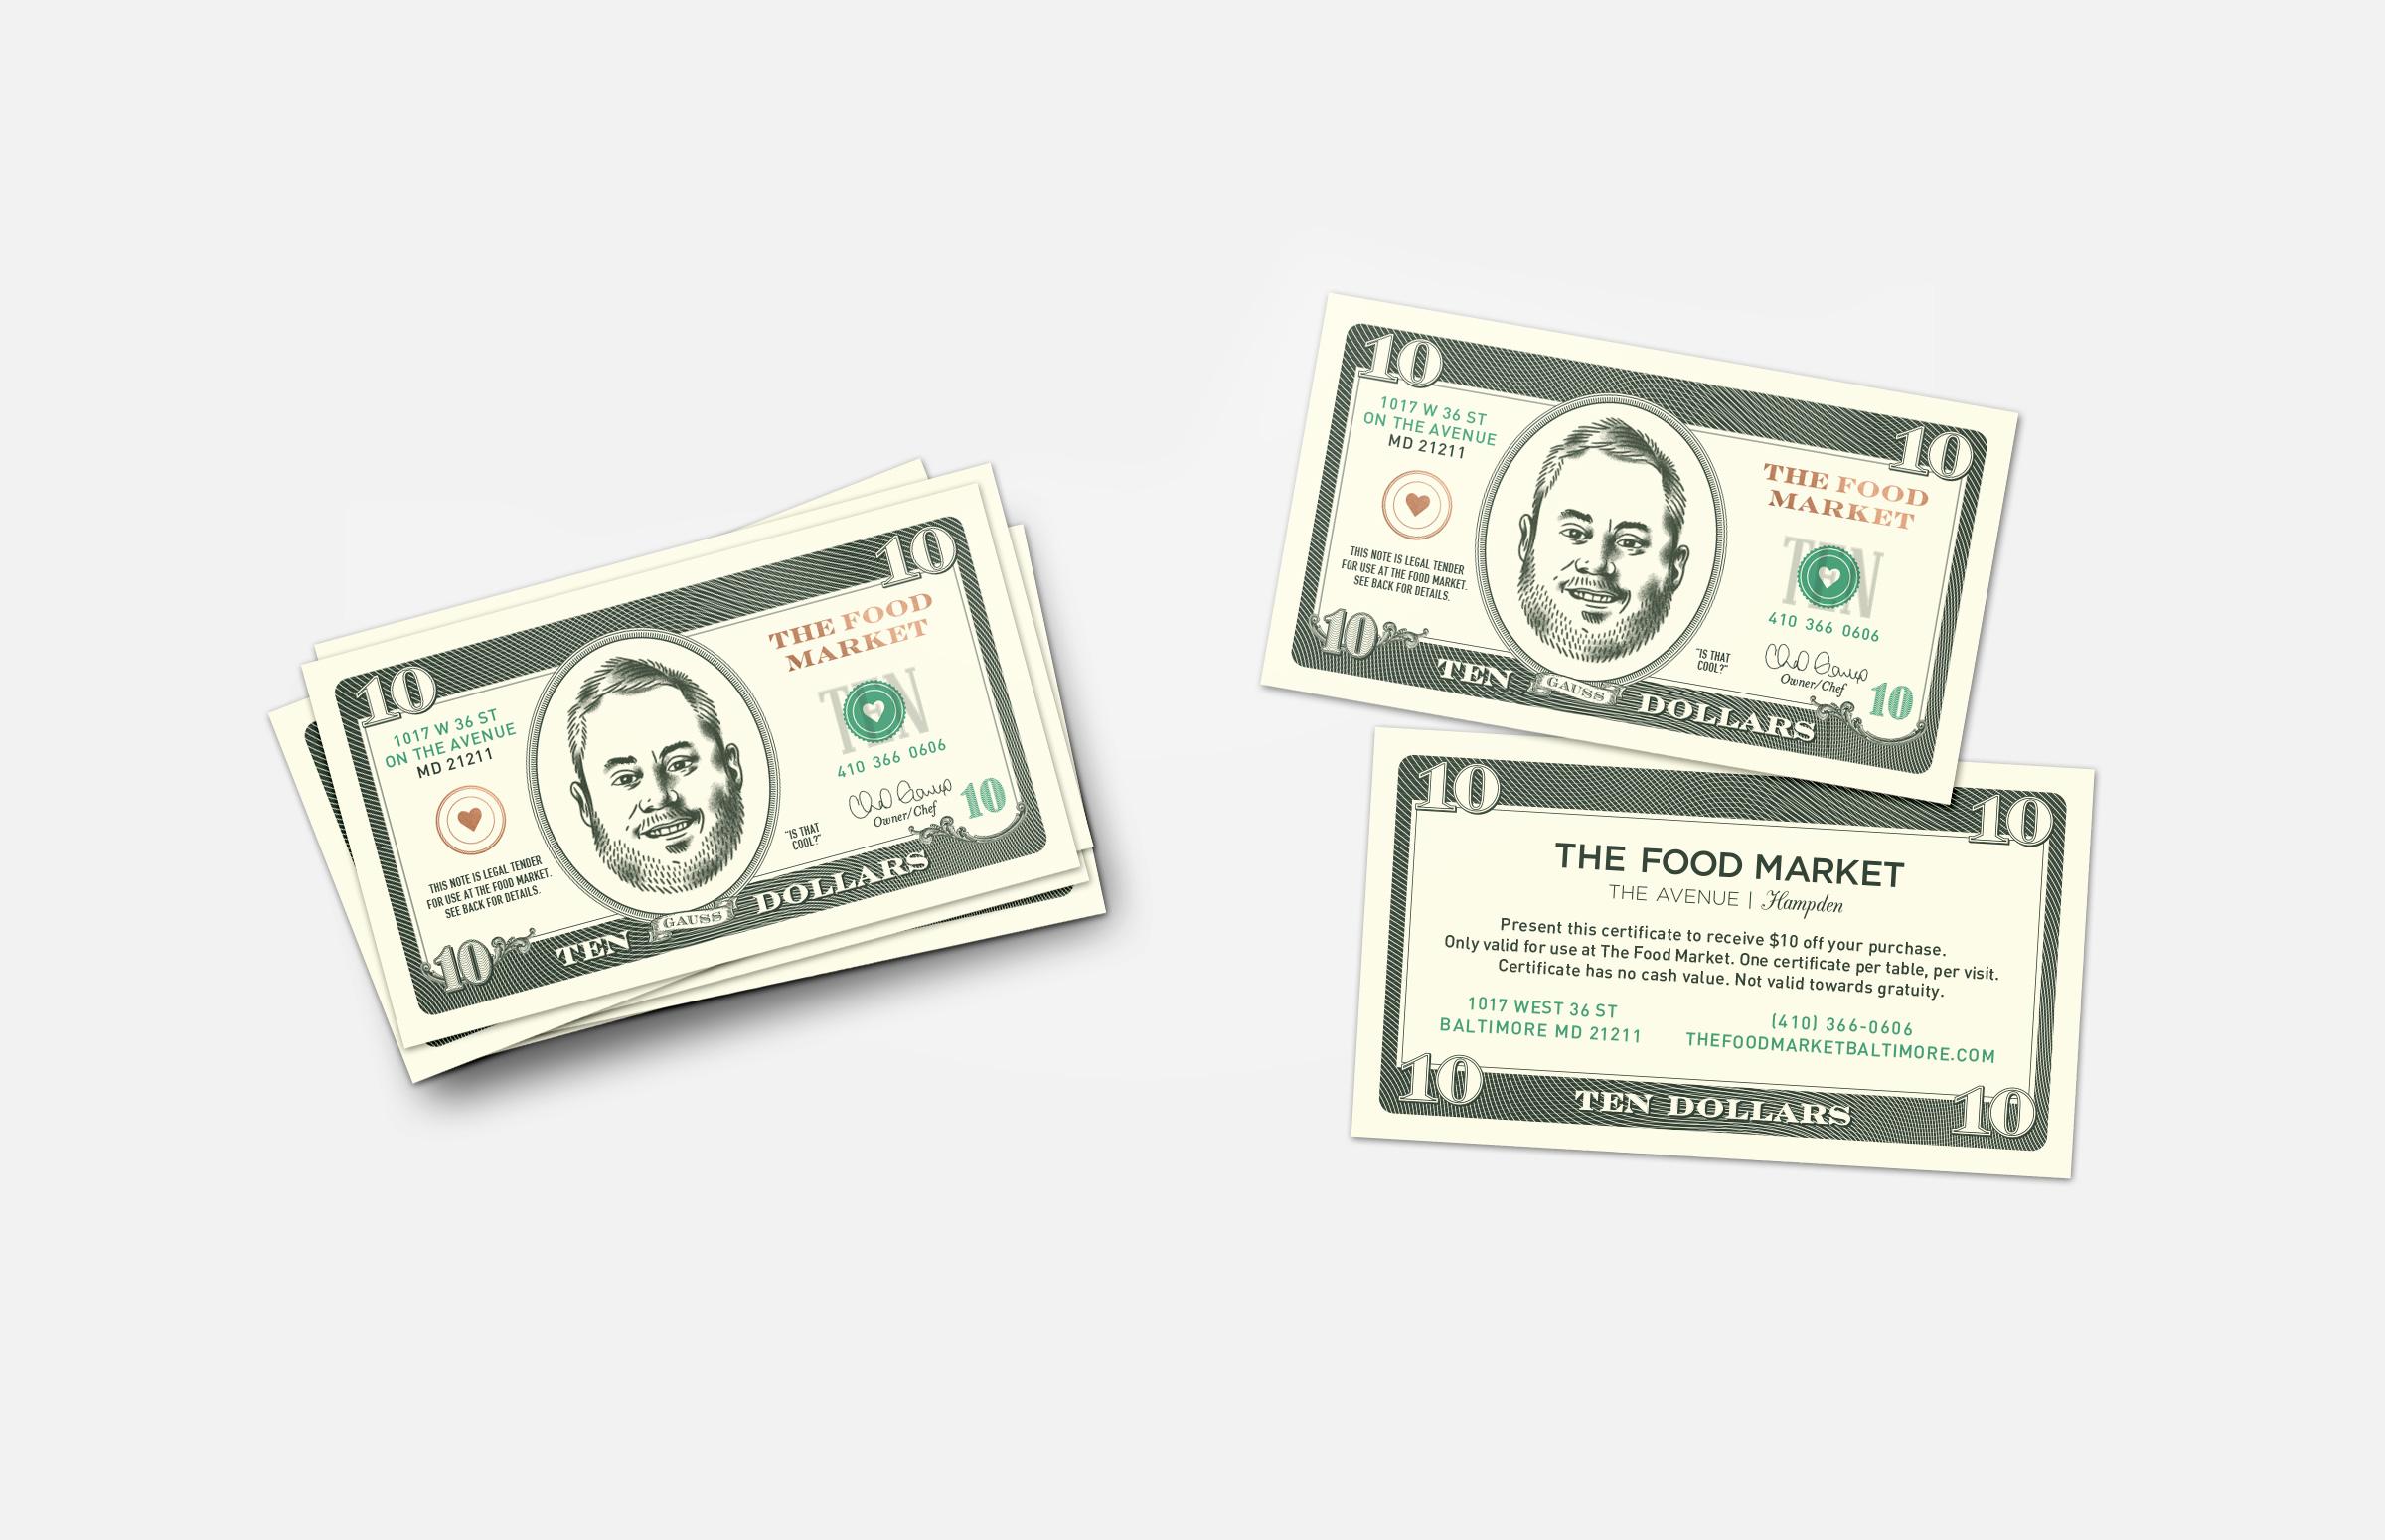 The Food Market: Ten Dollar Gift Certificate Design